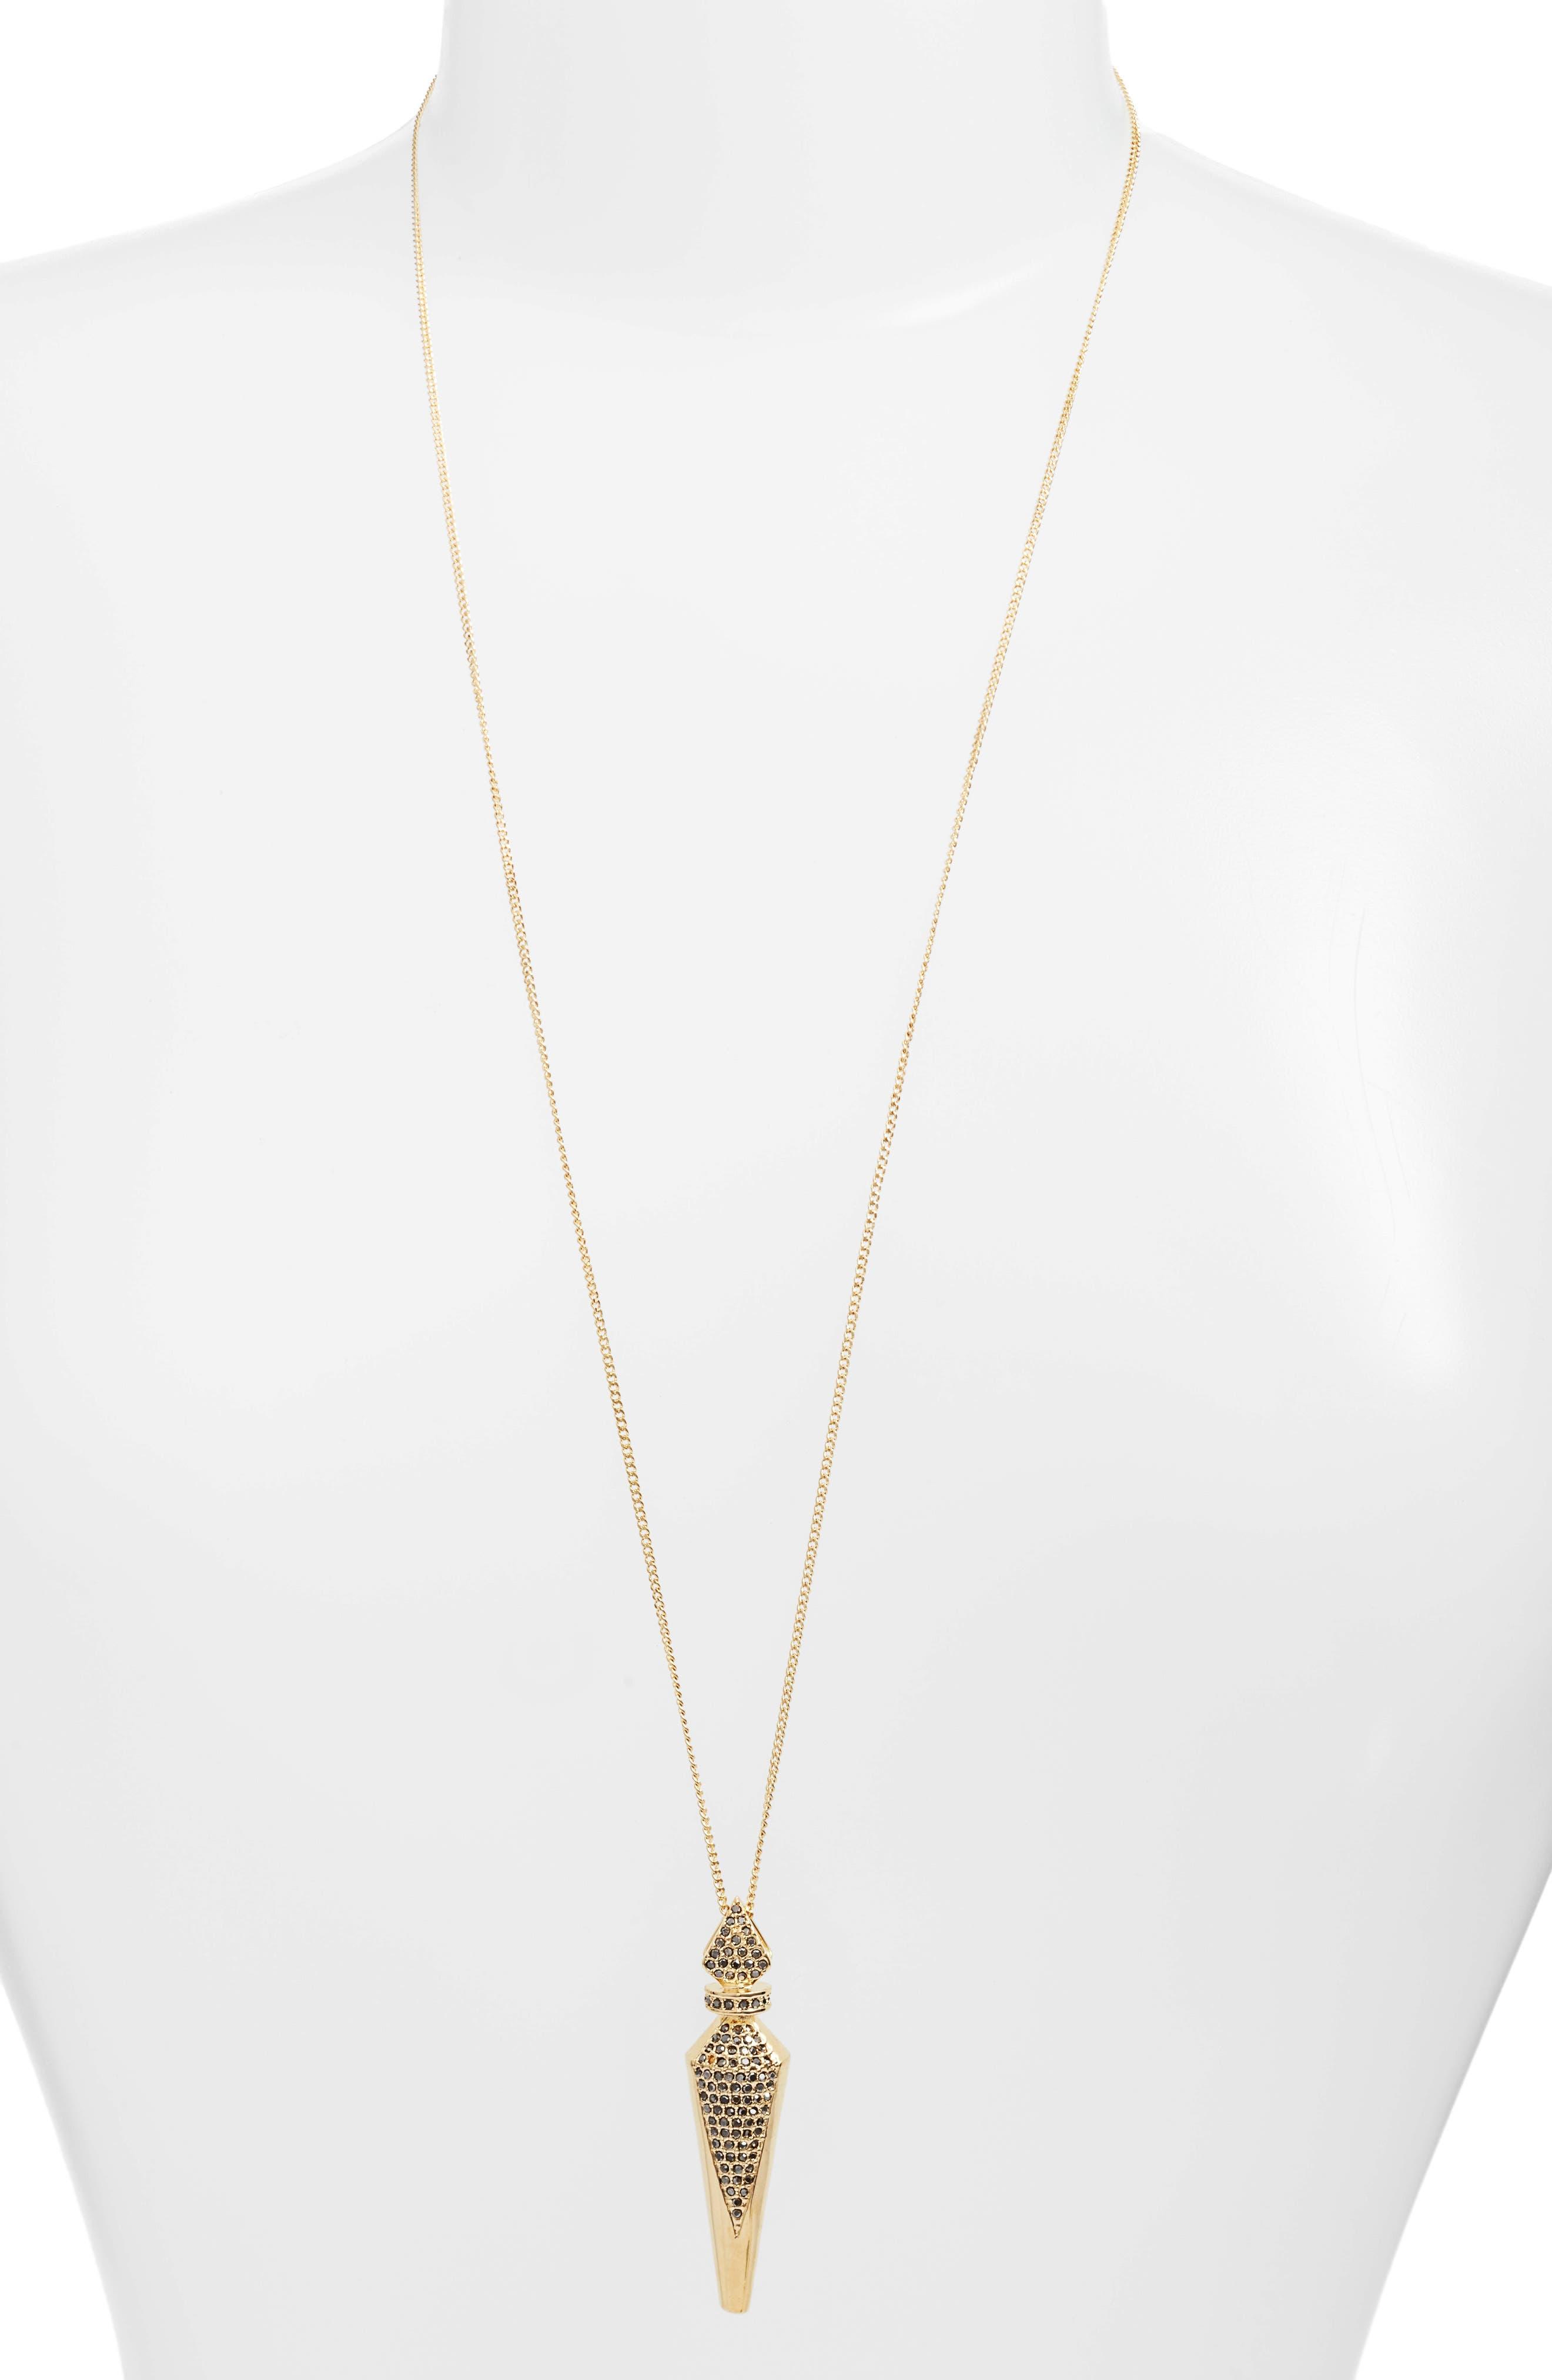 Main Image - Vince Camuto Pavé Crystal Pendant Necklace